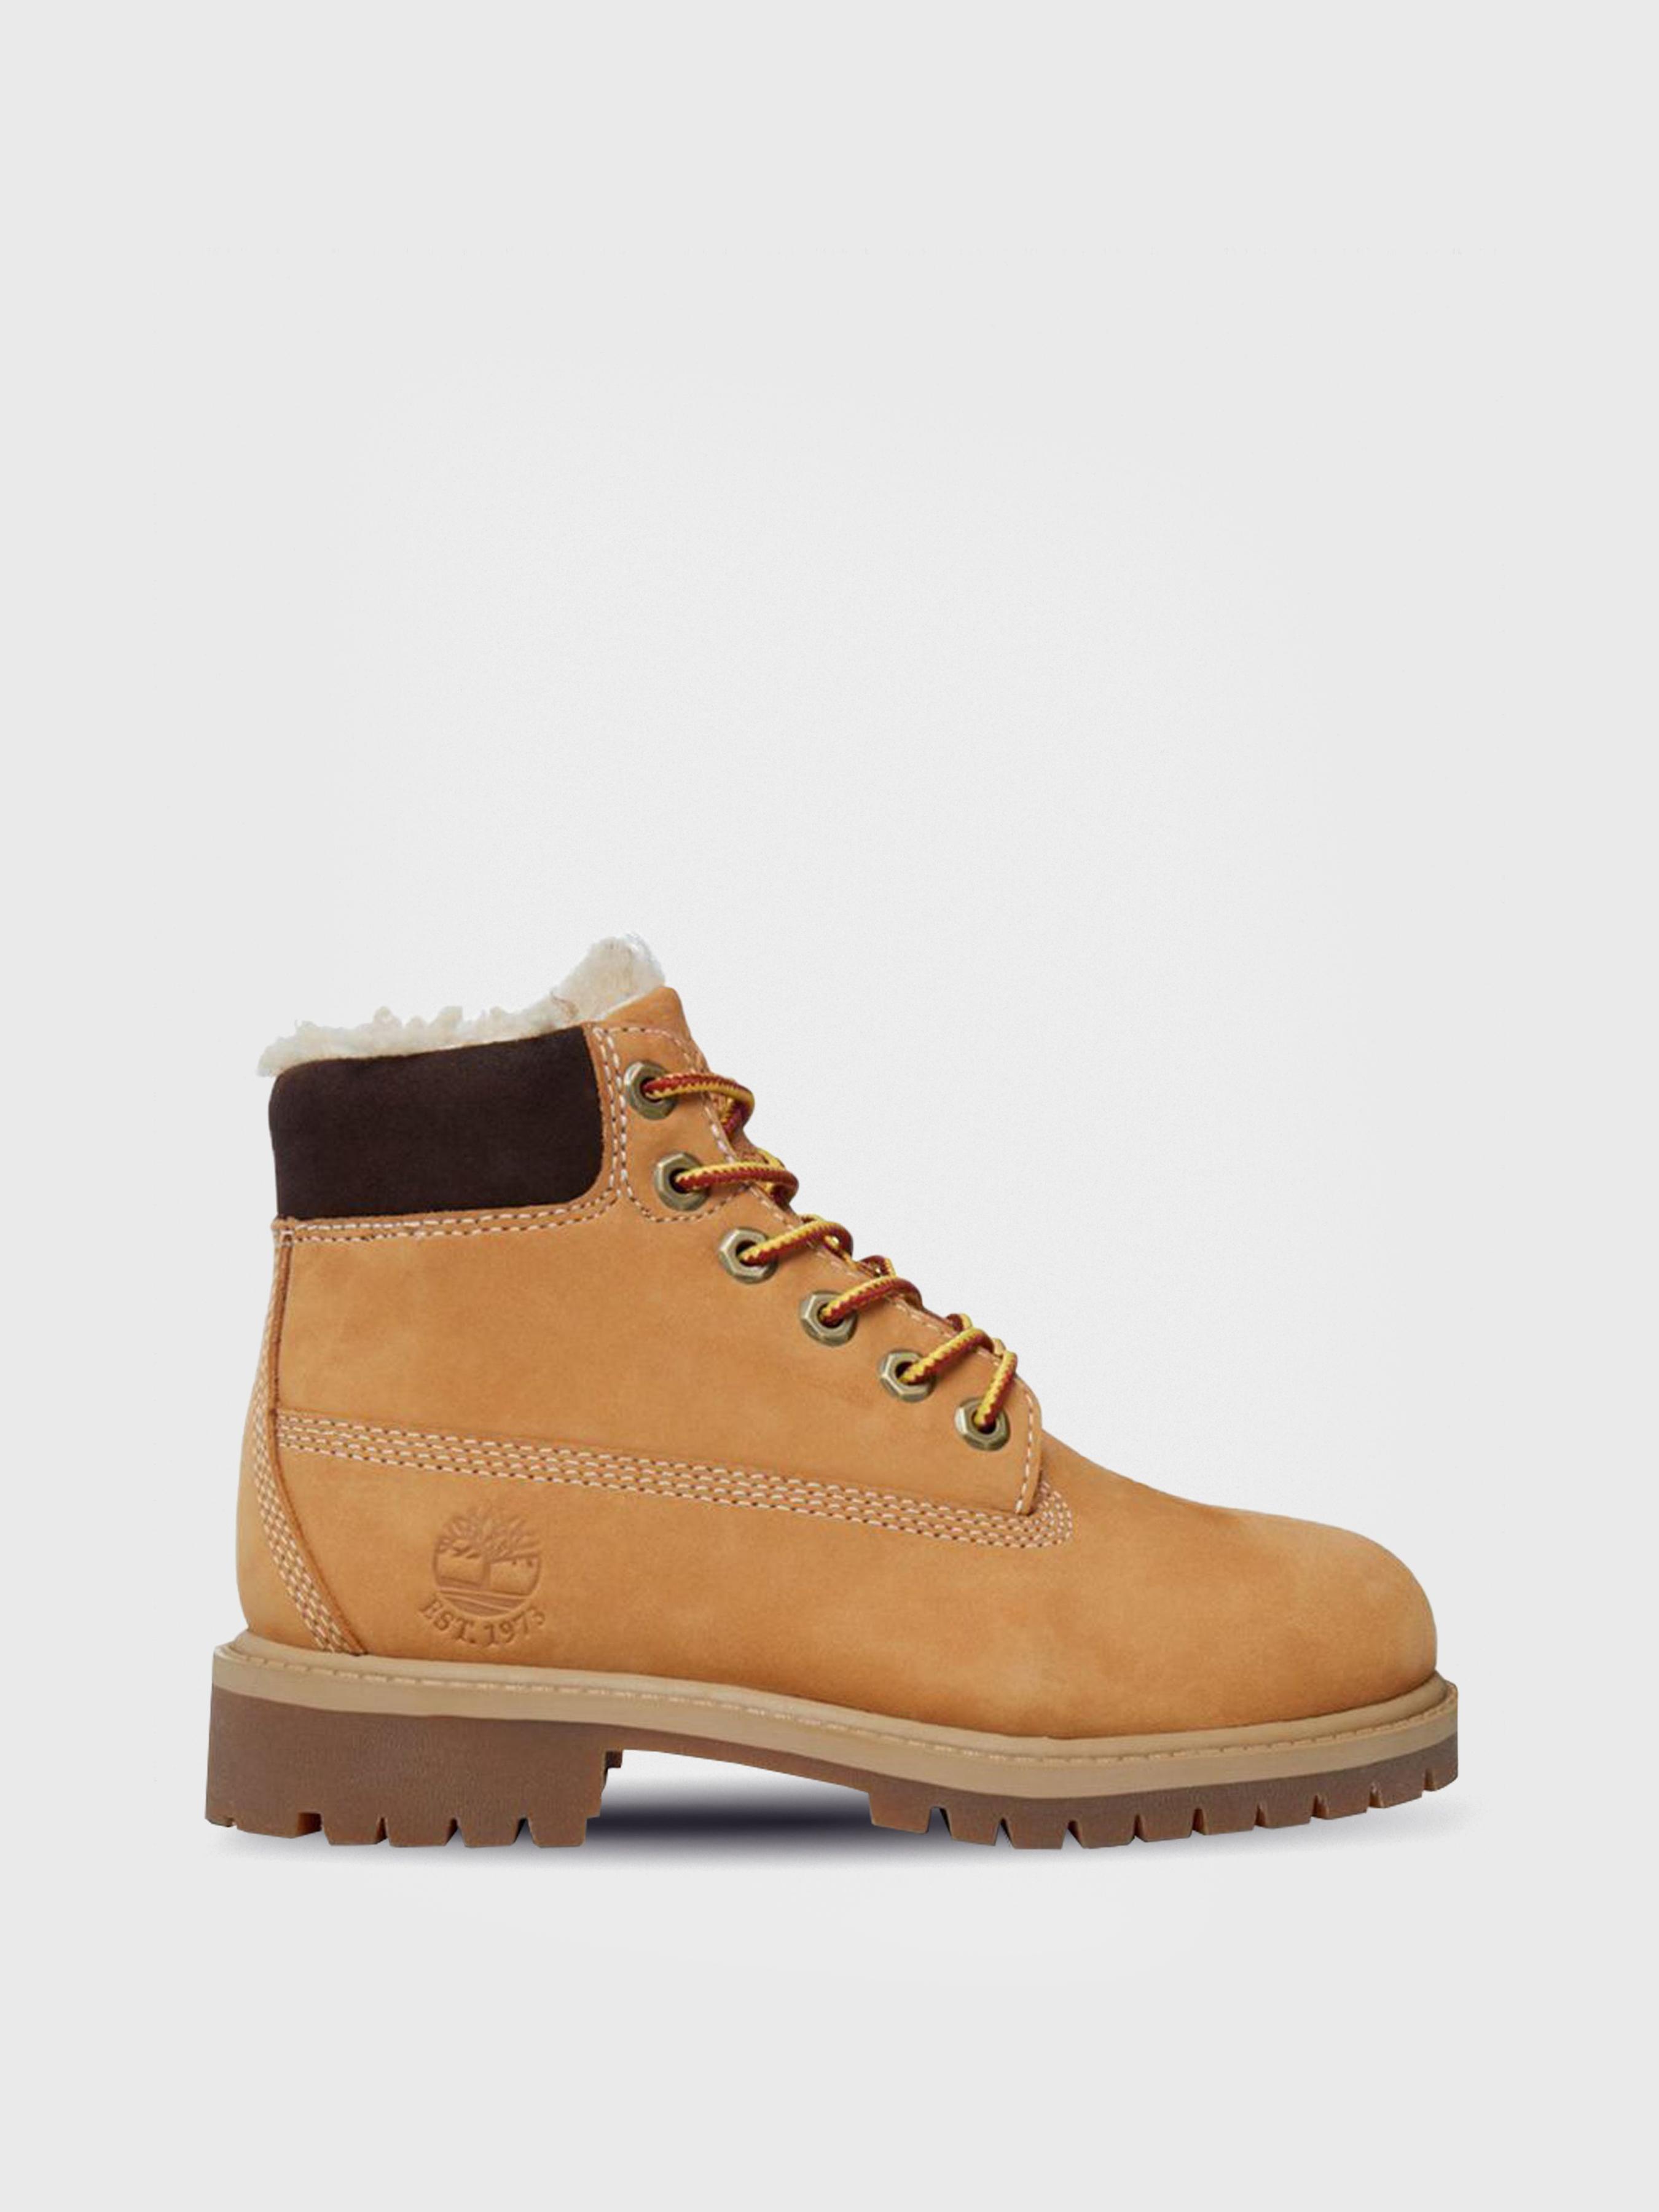 Ботинки детские Timberland модель TL1472. Ботинки для детей Timberland 6 In  WPF Warmlined TL1472 брендовая обувь, 2017 4bcdaf47591